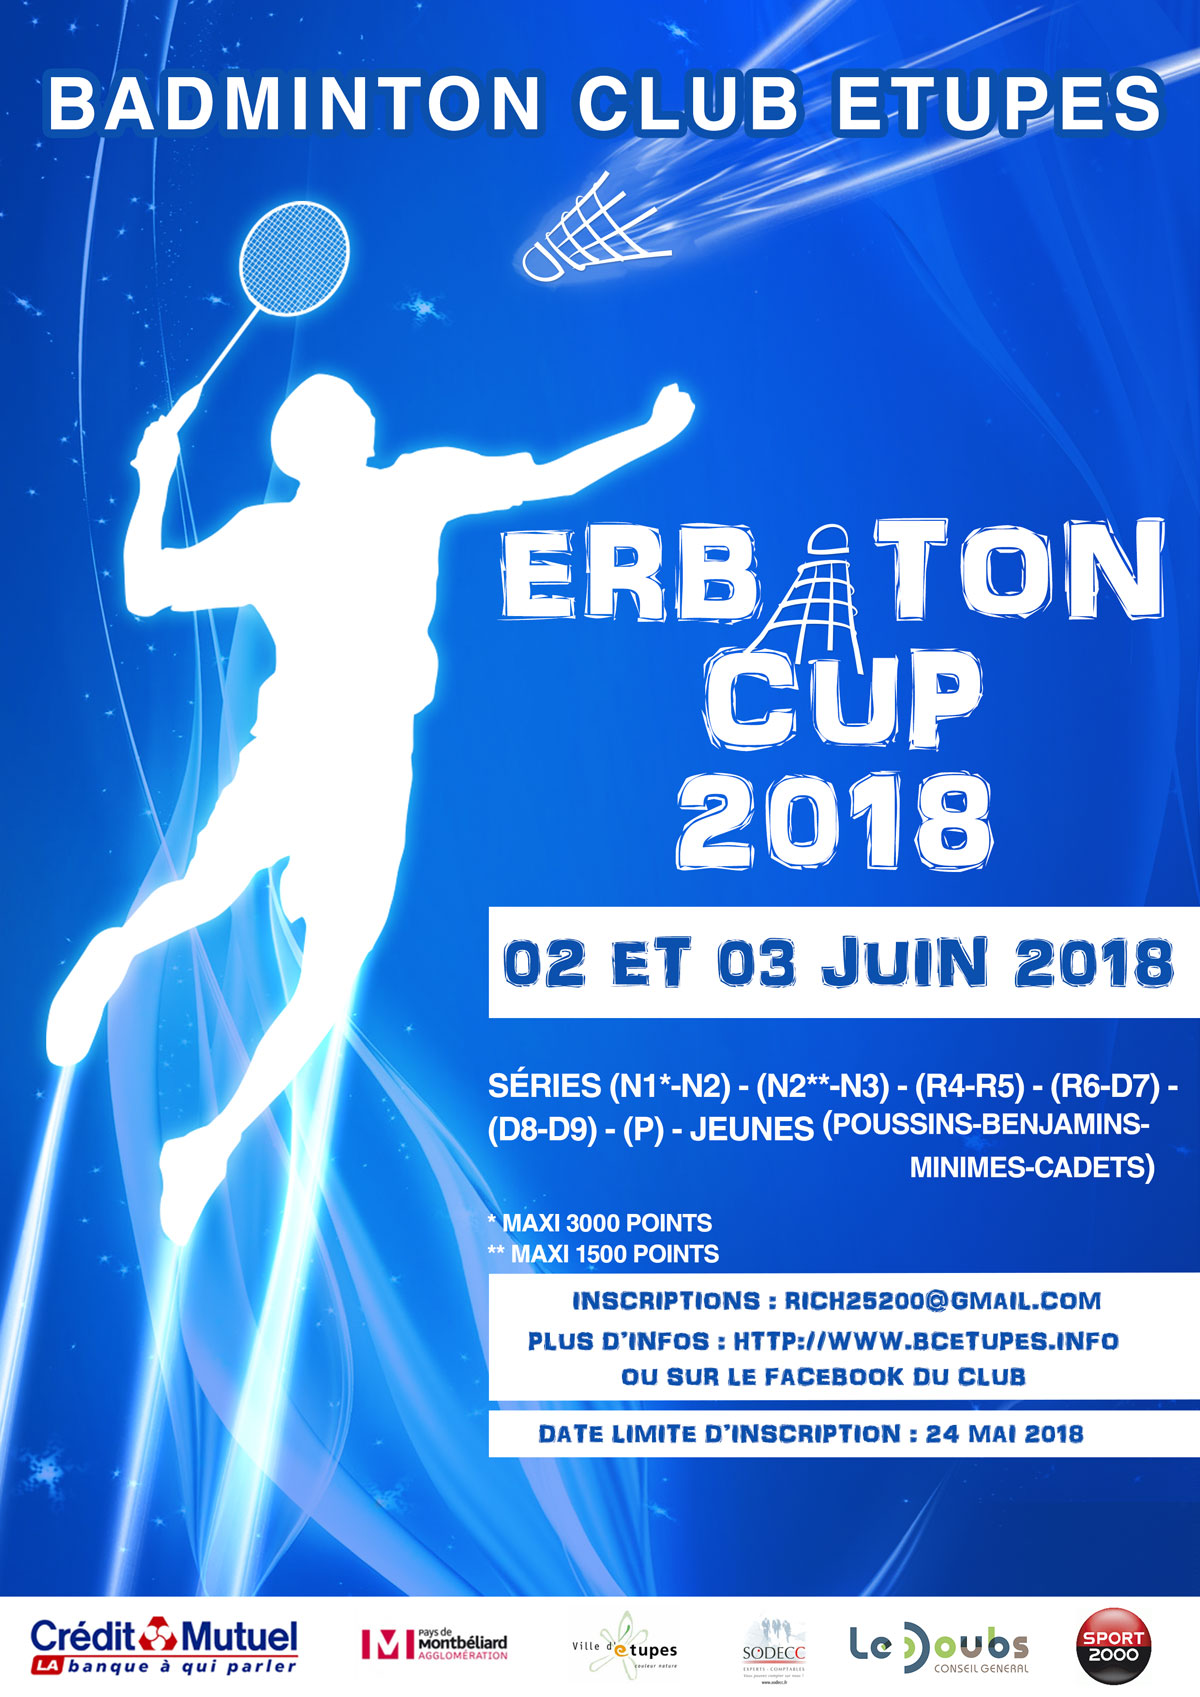 https://www.bcetupes.info/wp-content/uploads/2018/03/Erbaton-Cup-V2-2018.jpg